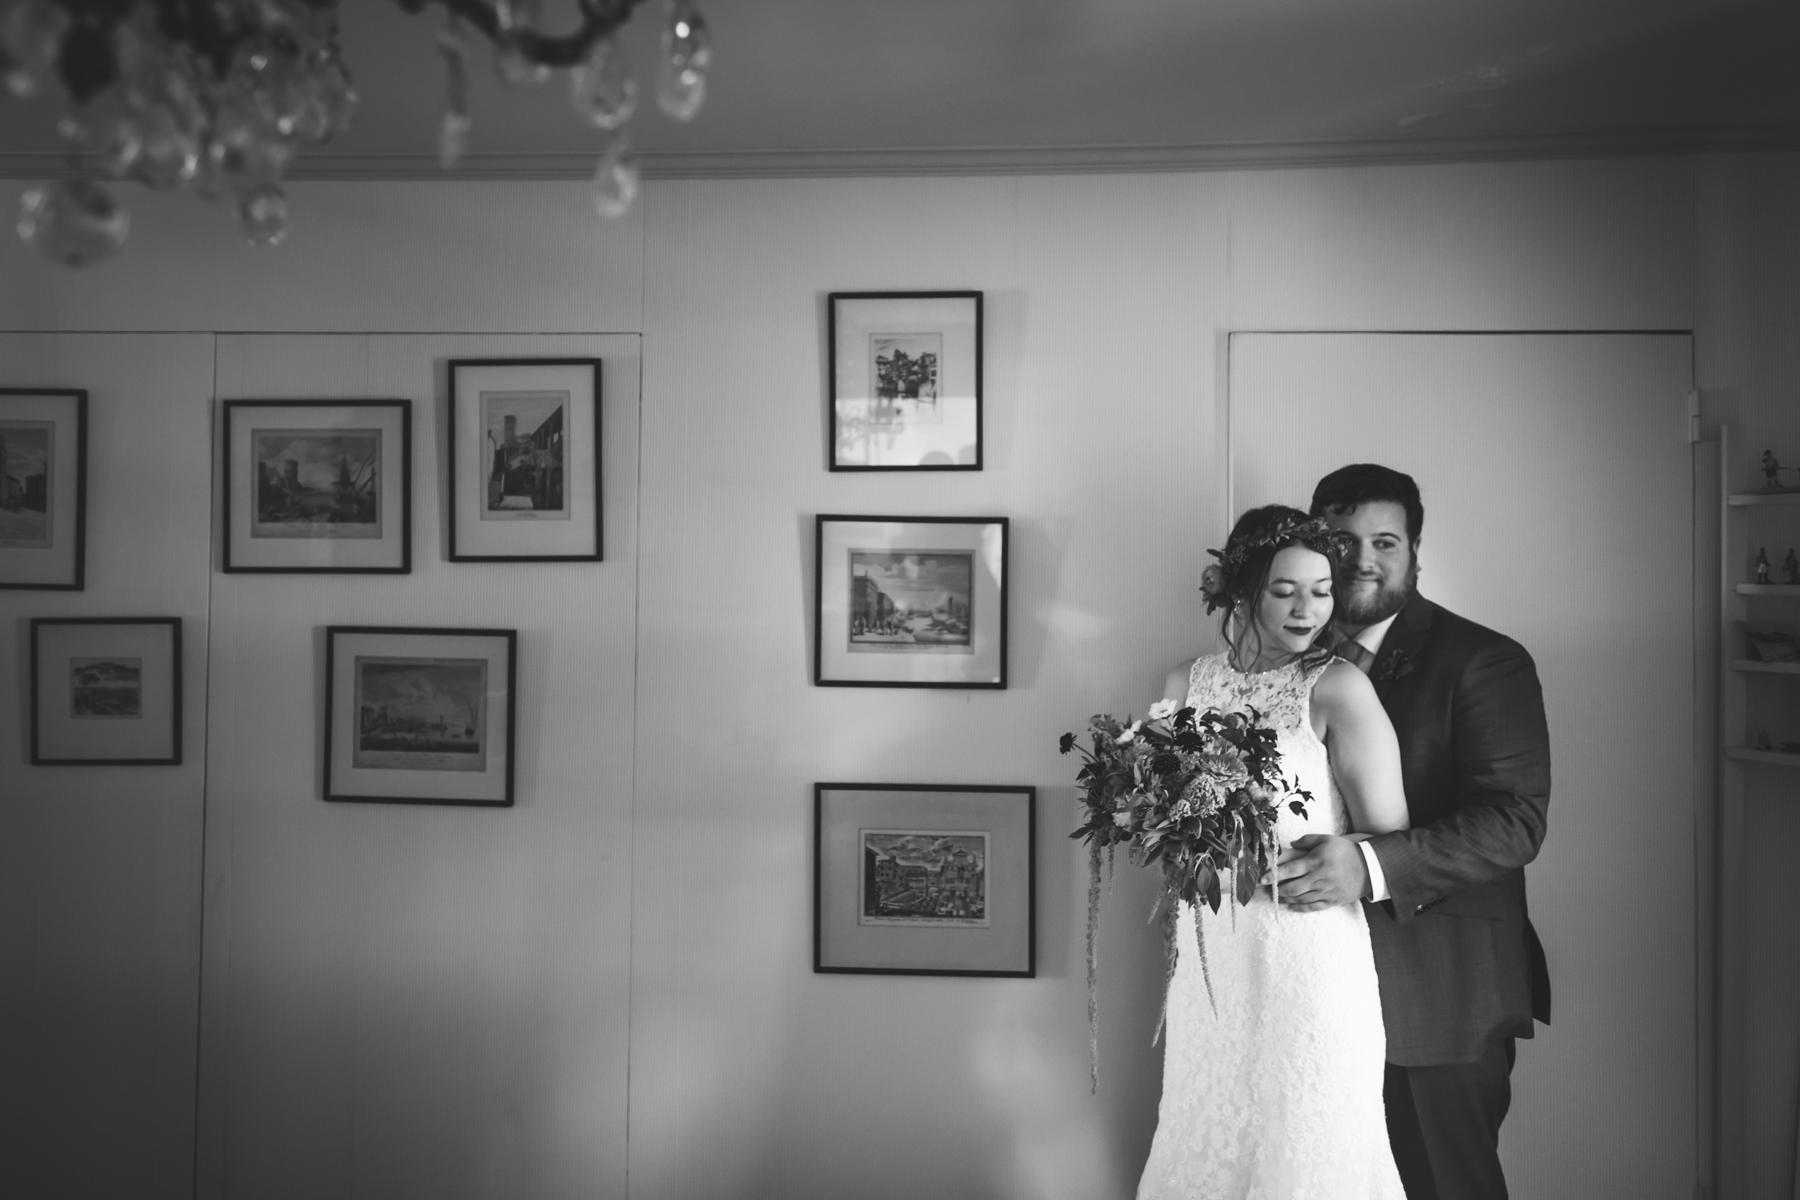 Long-Island-Documentary-Wedding-Photography-Summer-Tent-Wedding-in-New-York-39.jpg